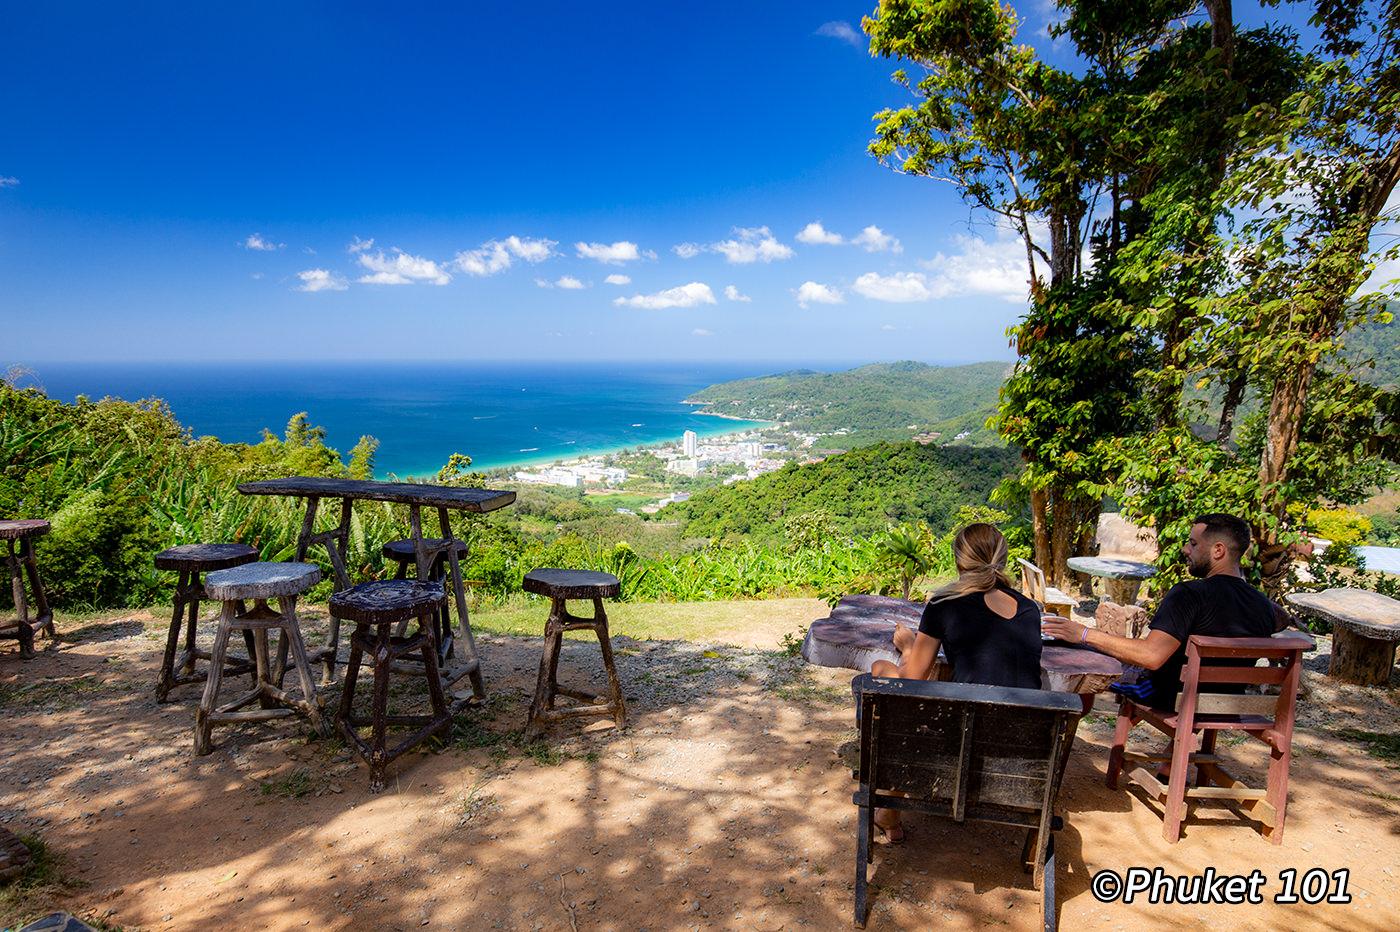 Nakkerd Seaview Cafe at Big Buddha Phuket